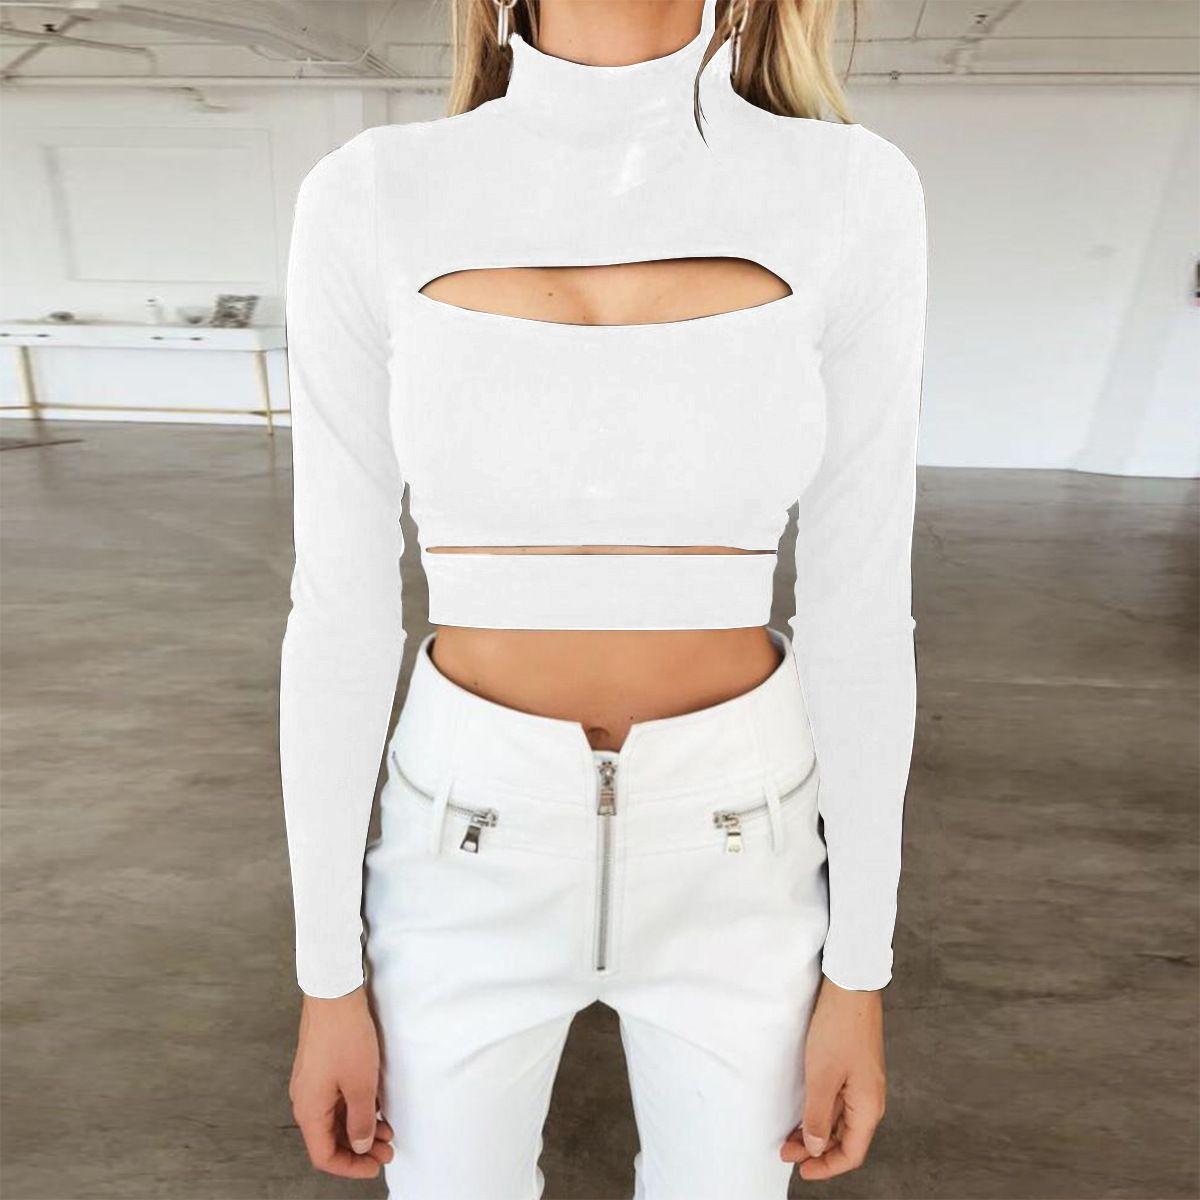 New Sexy Cutout Long Sleeve Women Shirt Turtleneck Solid Women Tops Bottom Shirts Fahsion Sweatshirt White Black Size S-XL